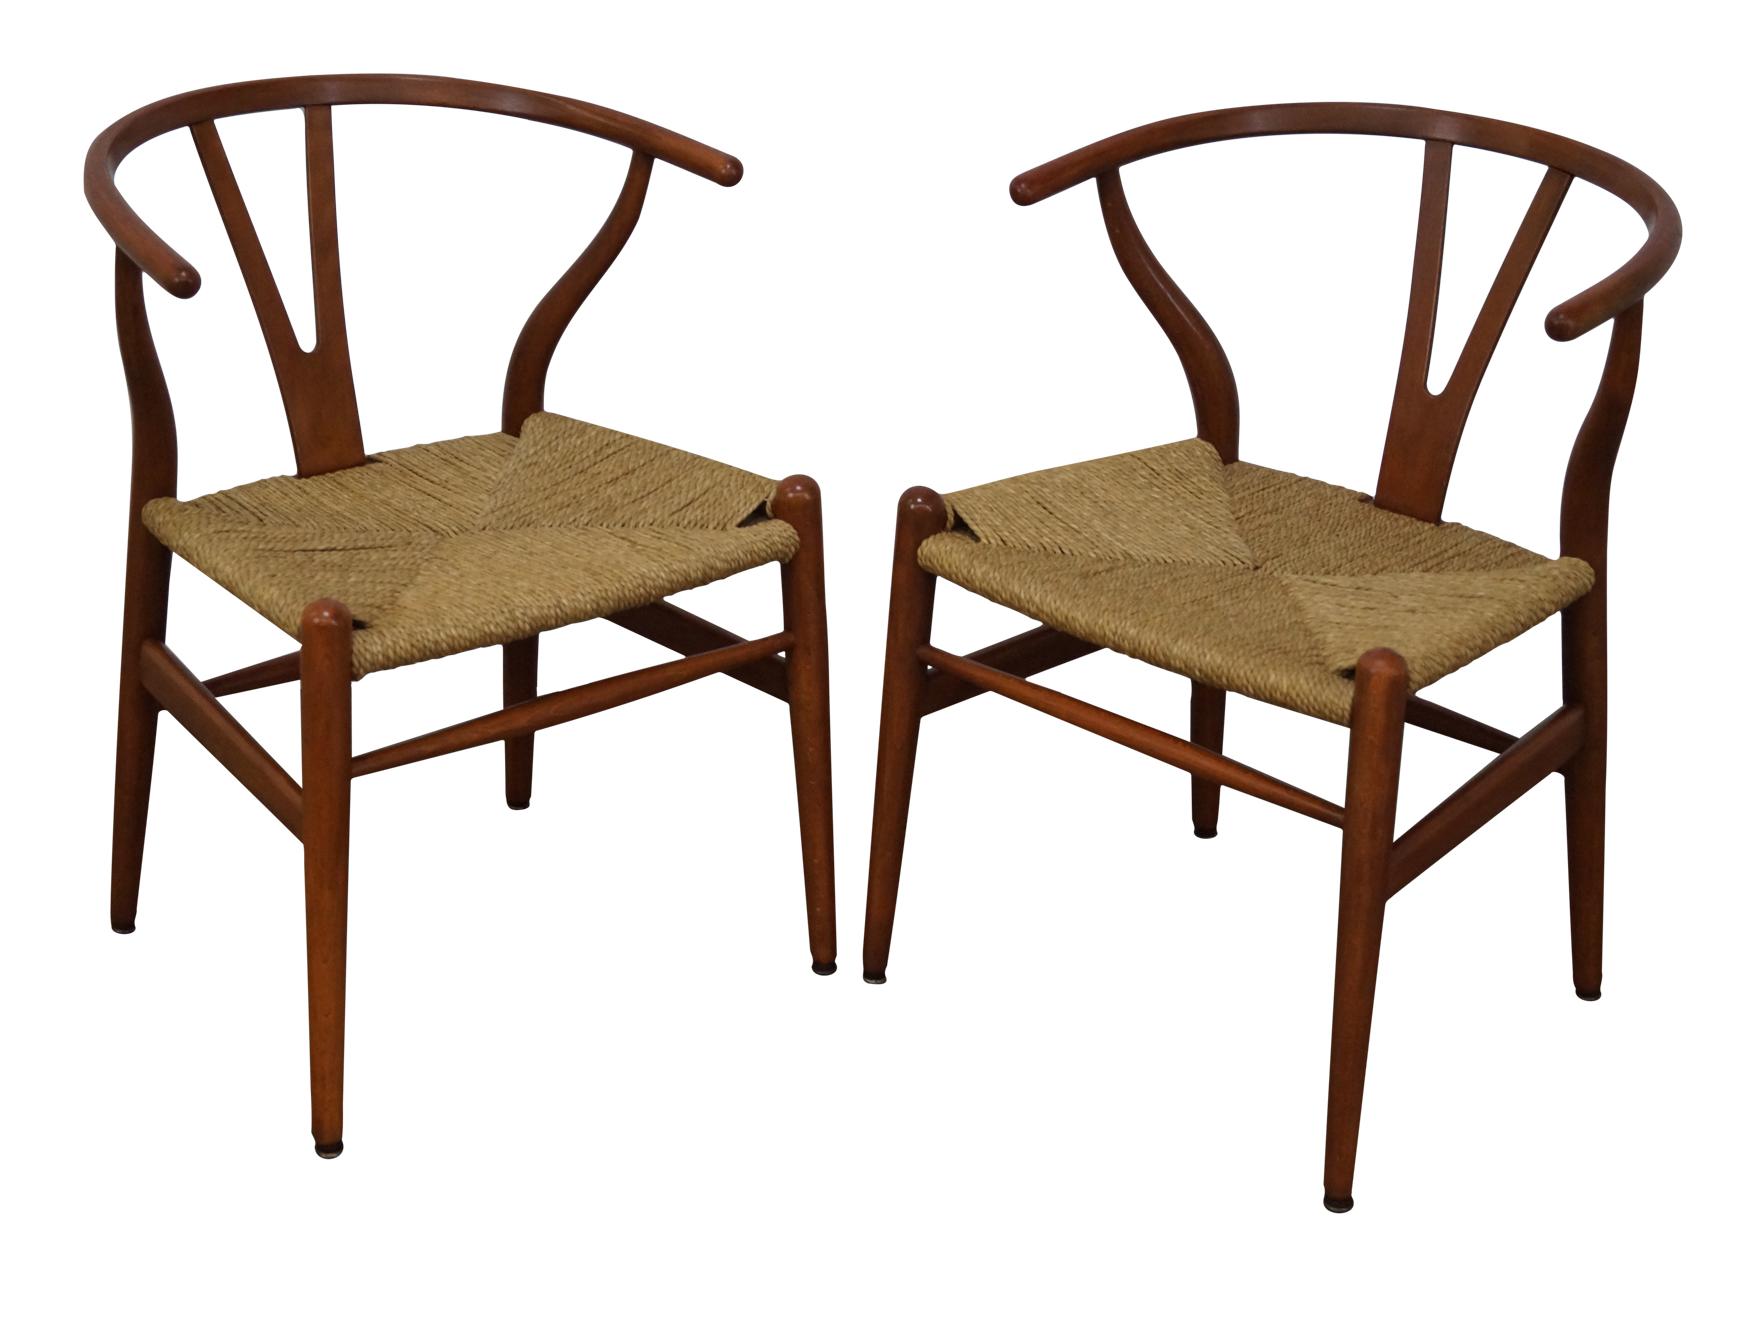 hans wegner carl hansen wishbone chairs pair chairish. Black Bedroom Furniture Sets. Home Design Ideas